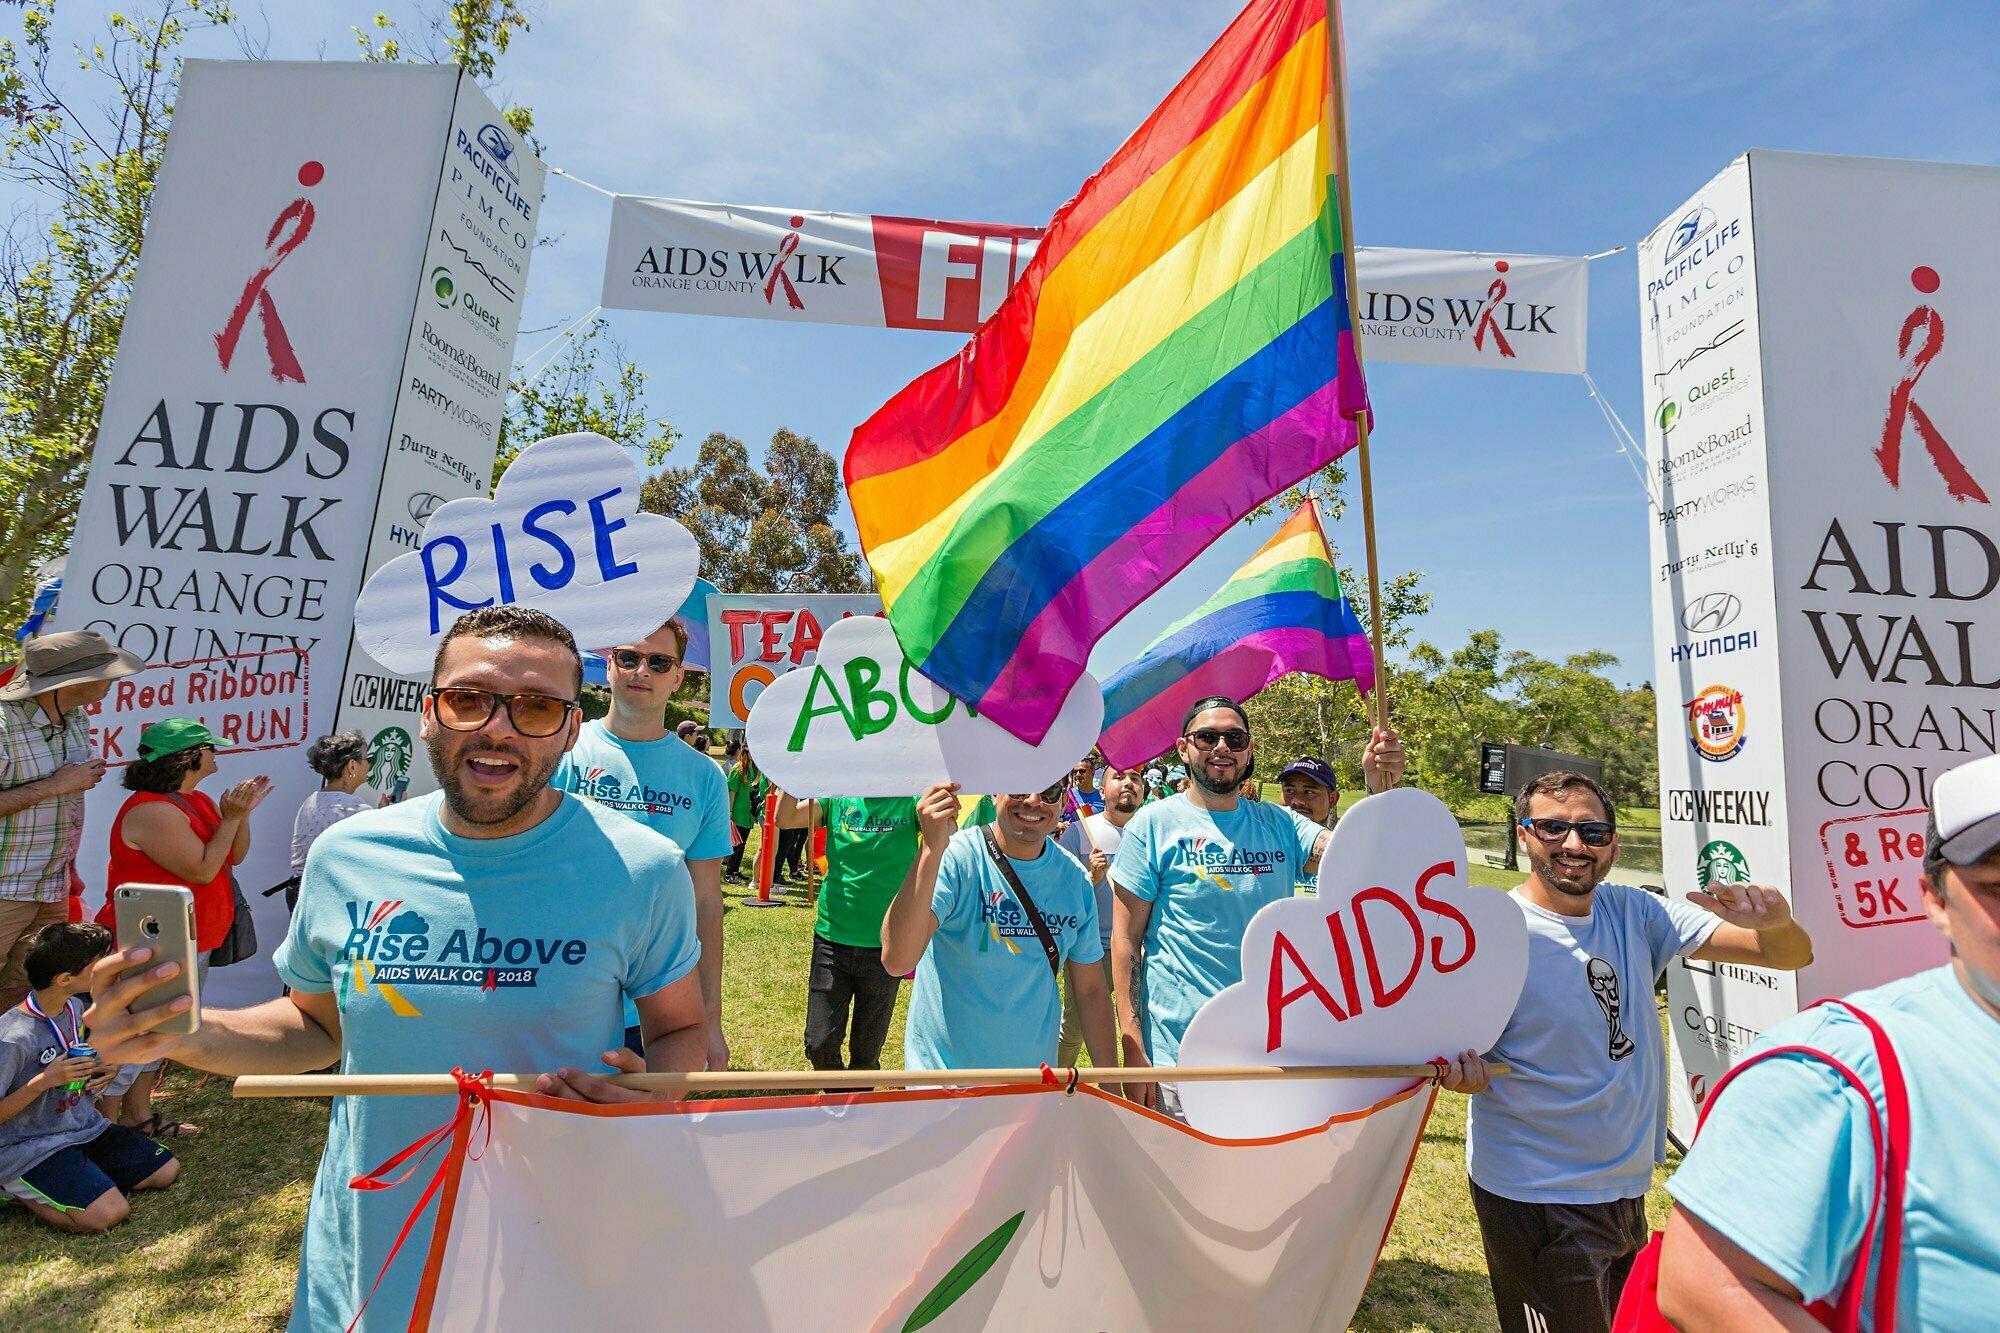 aids walk oc radiant health centers